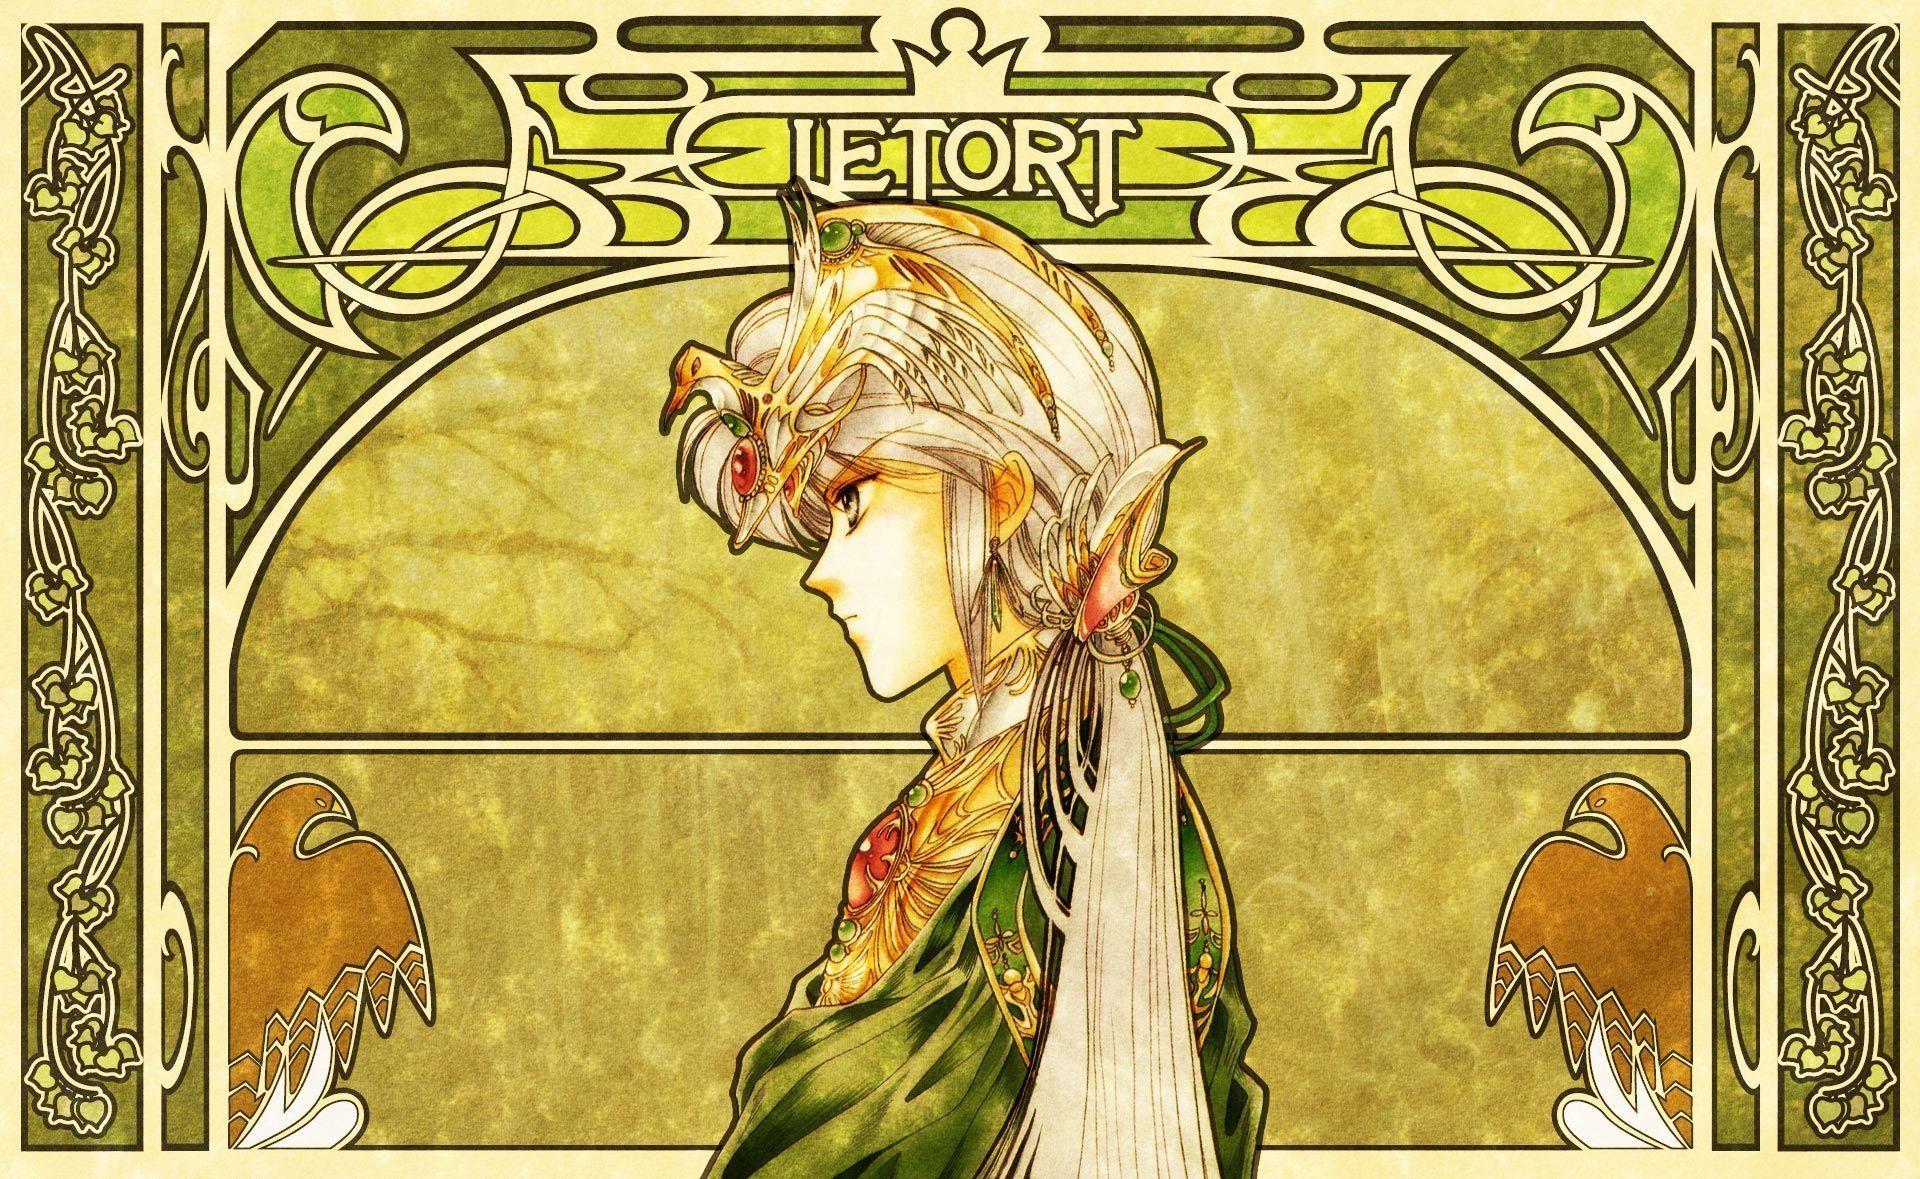 Collection Of Art Deco Desktop Wallpaper Art Nouveau Wallpaper Art Art Deco Wallpaper